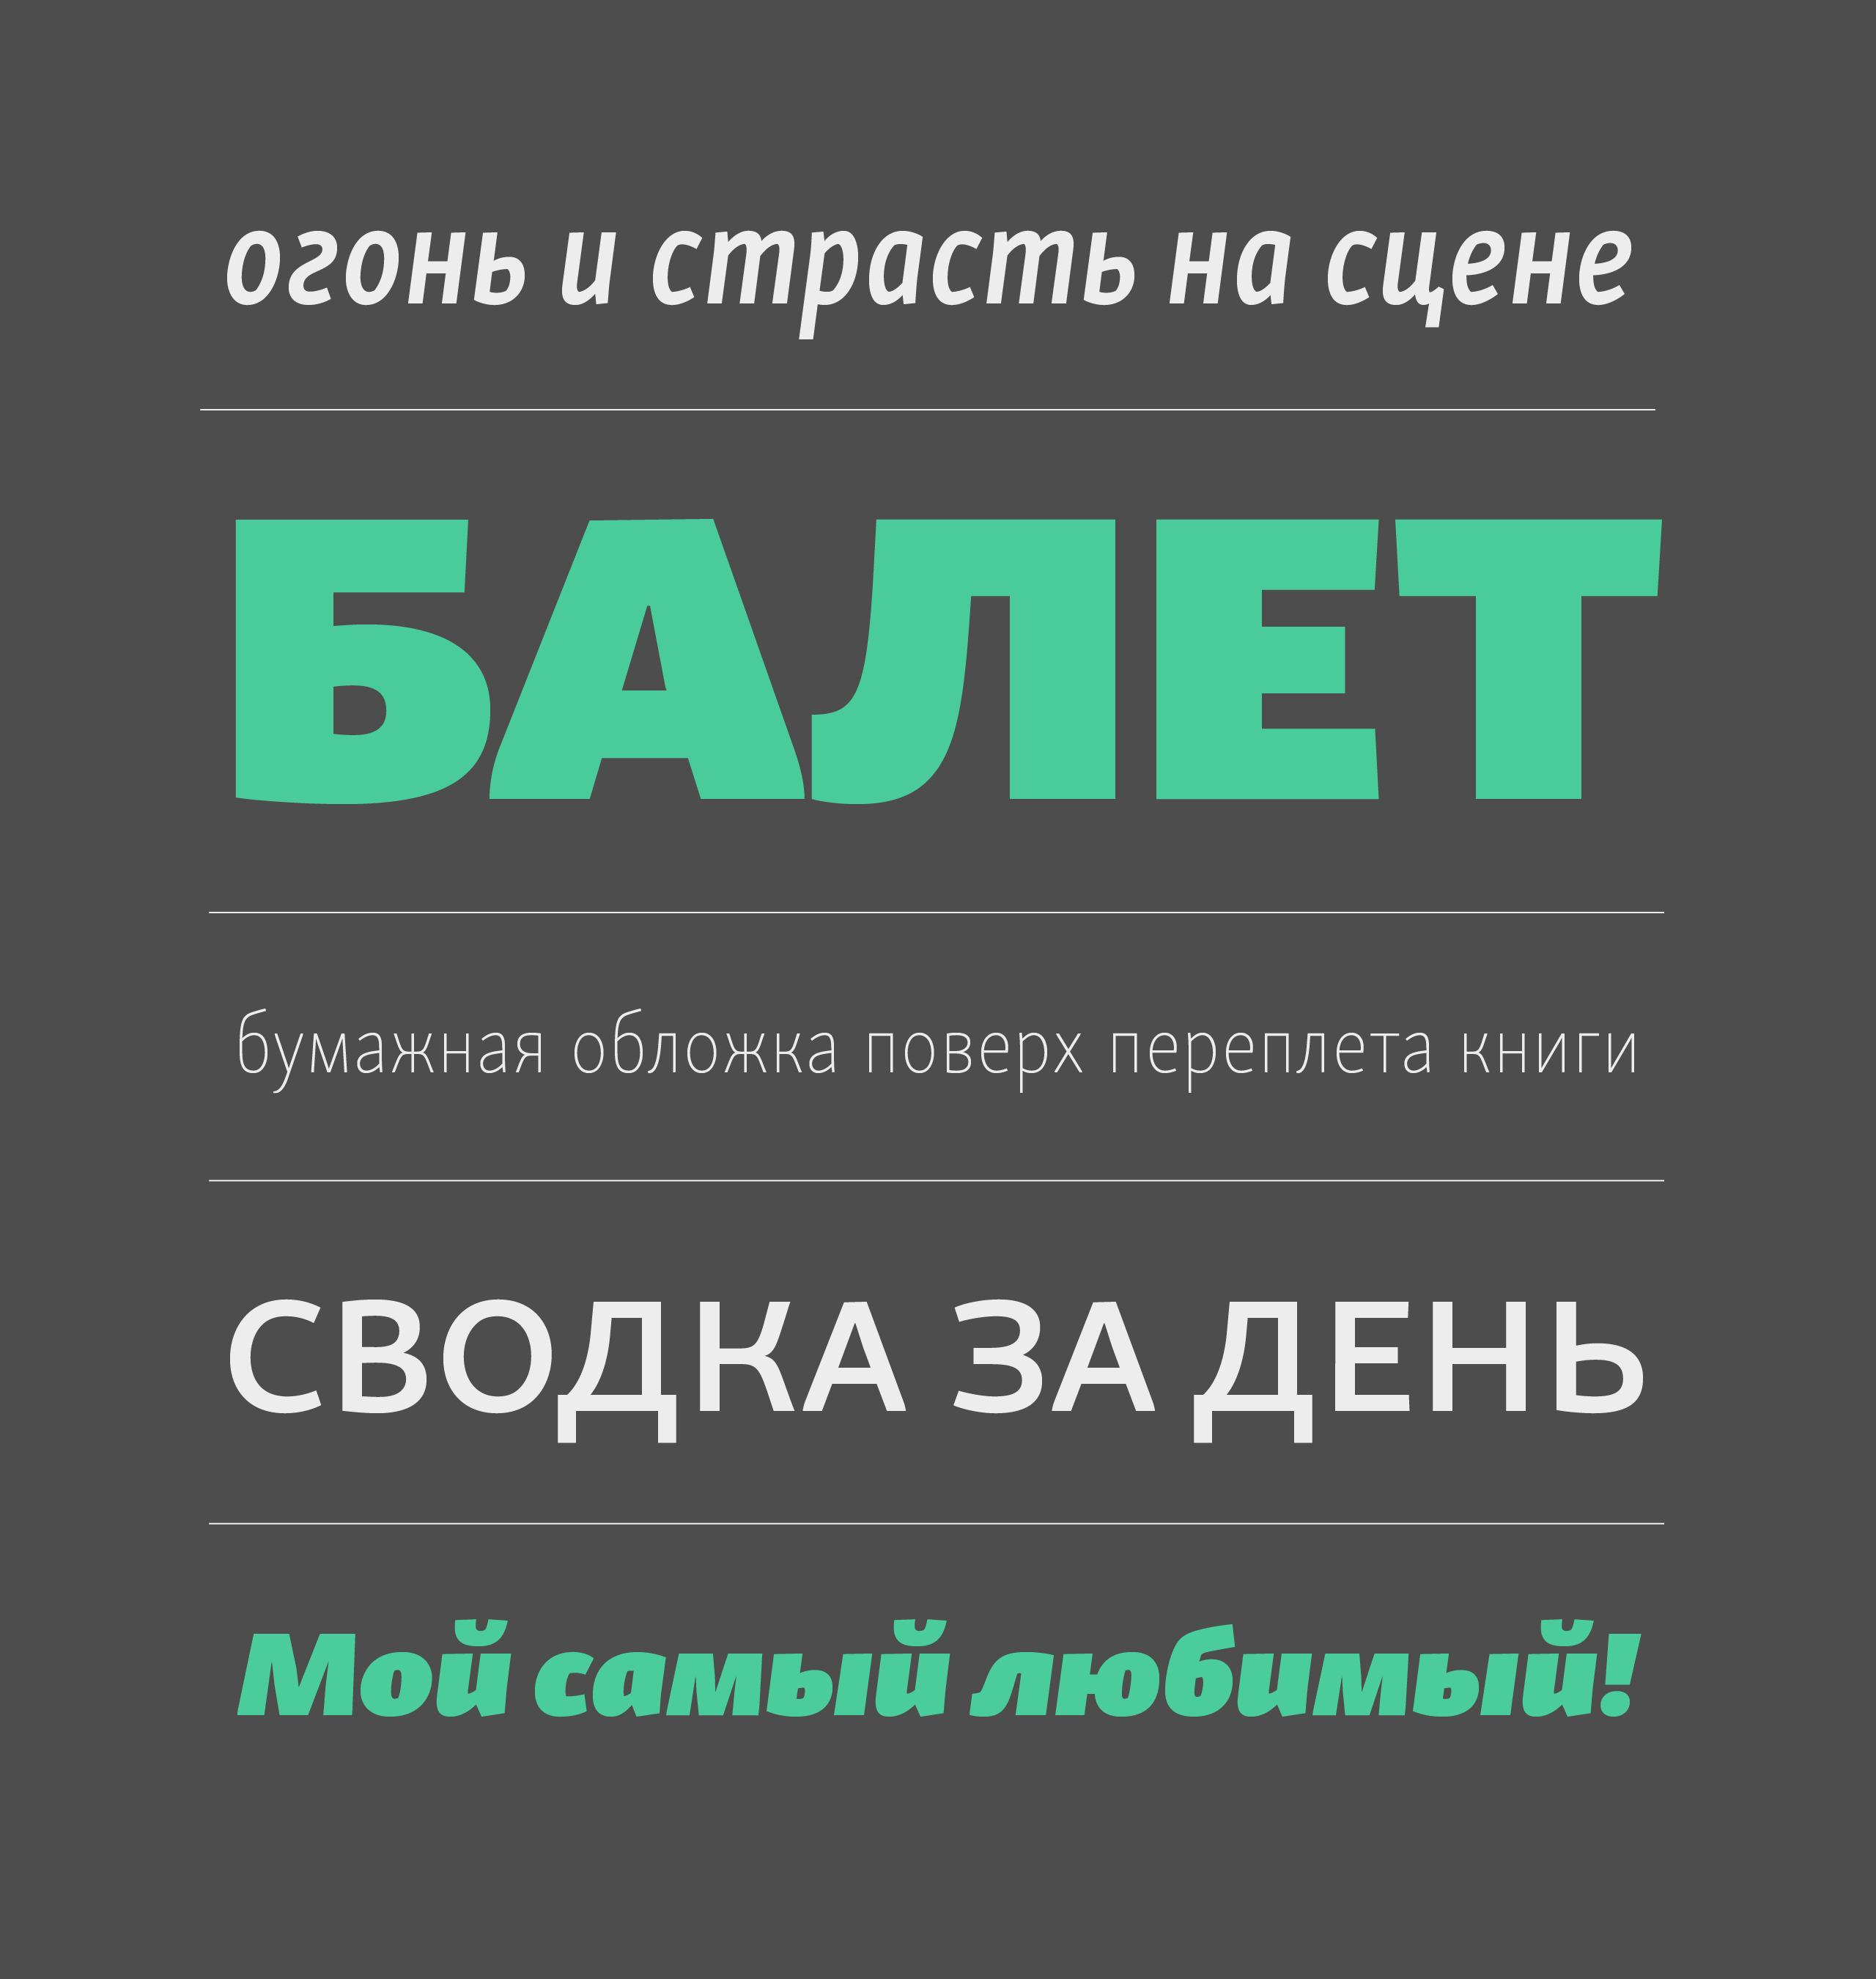 SkolarSans_specimen_03B